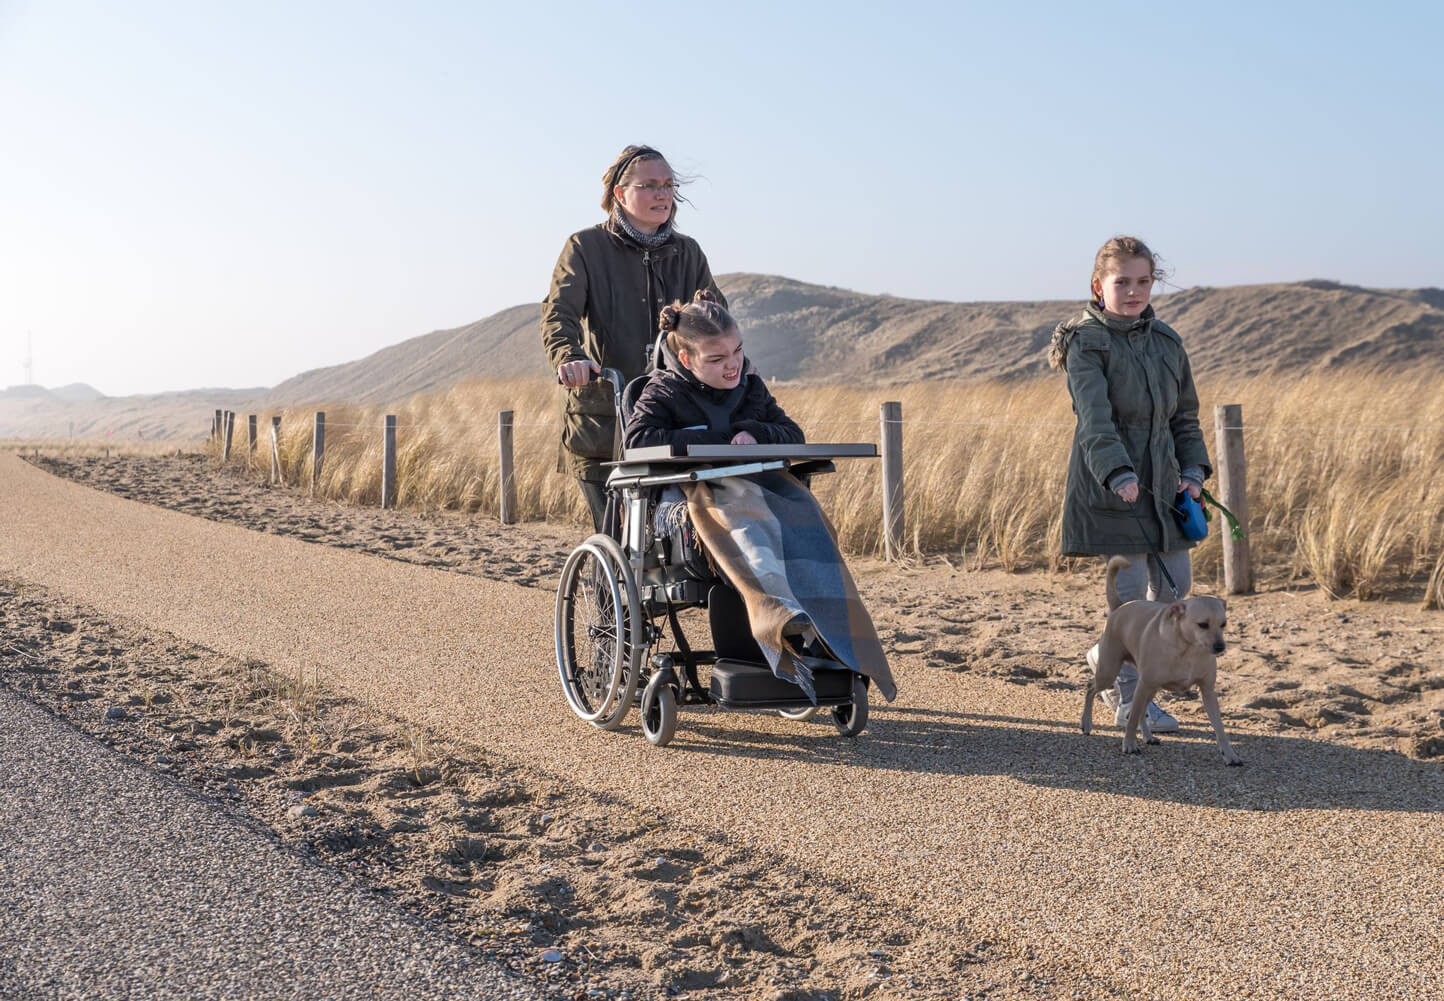 Special needs childcare